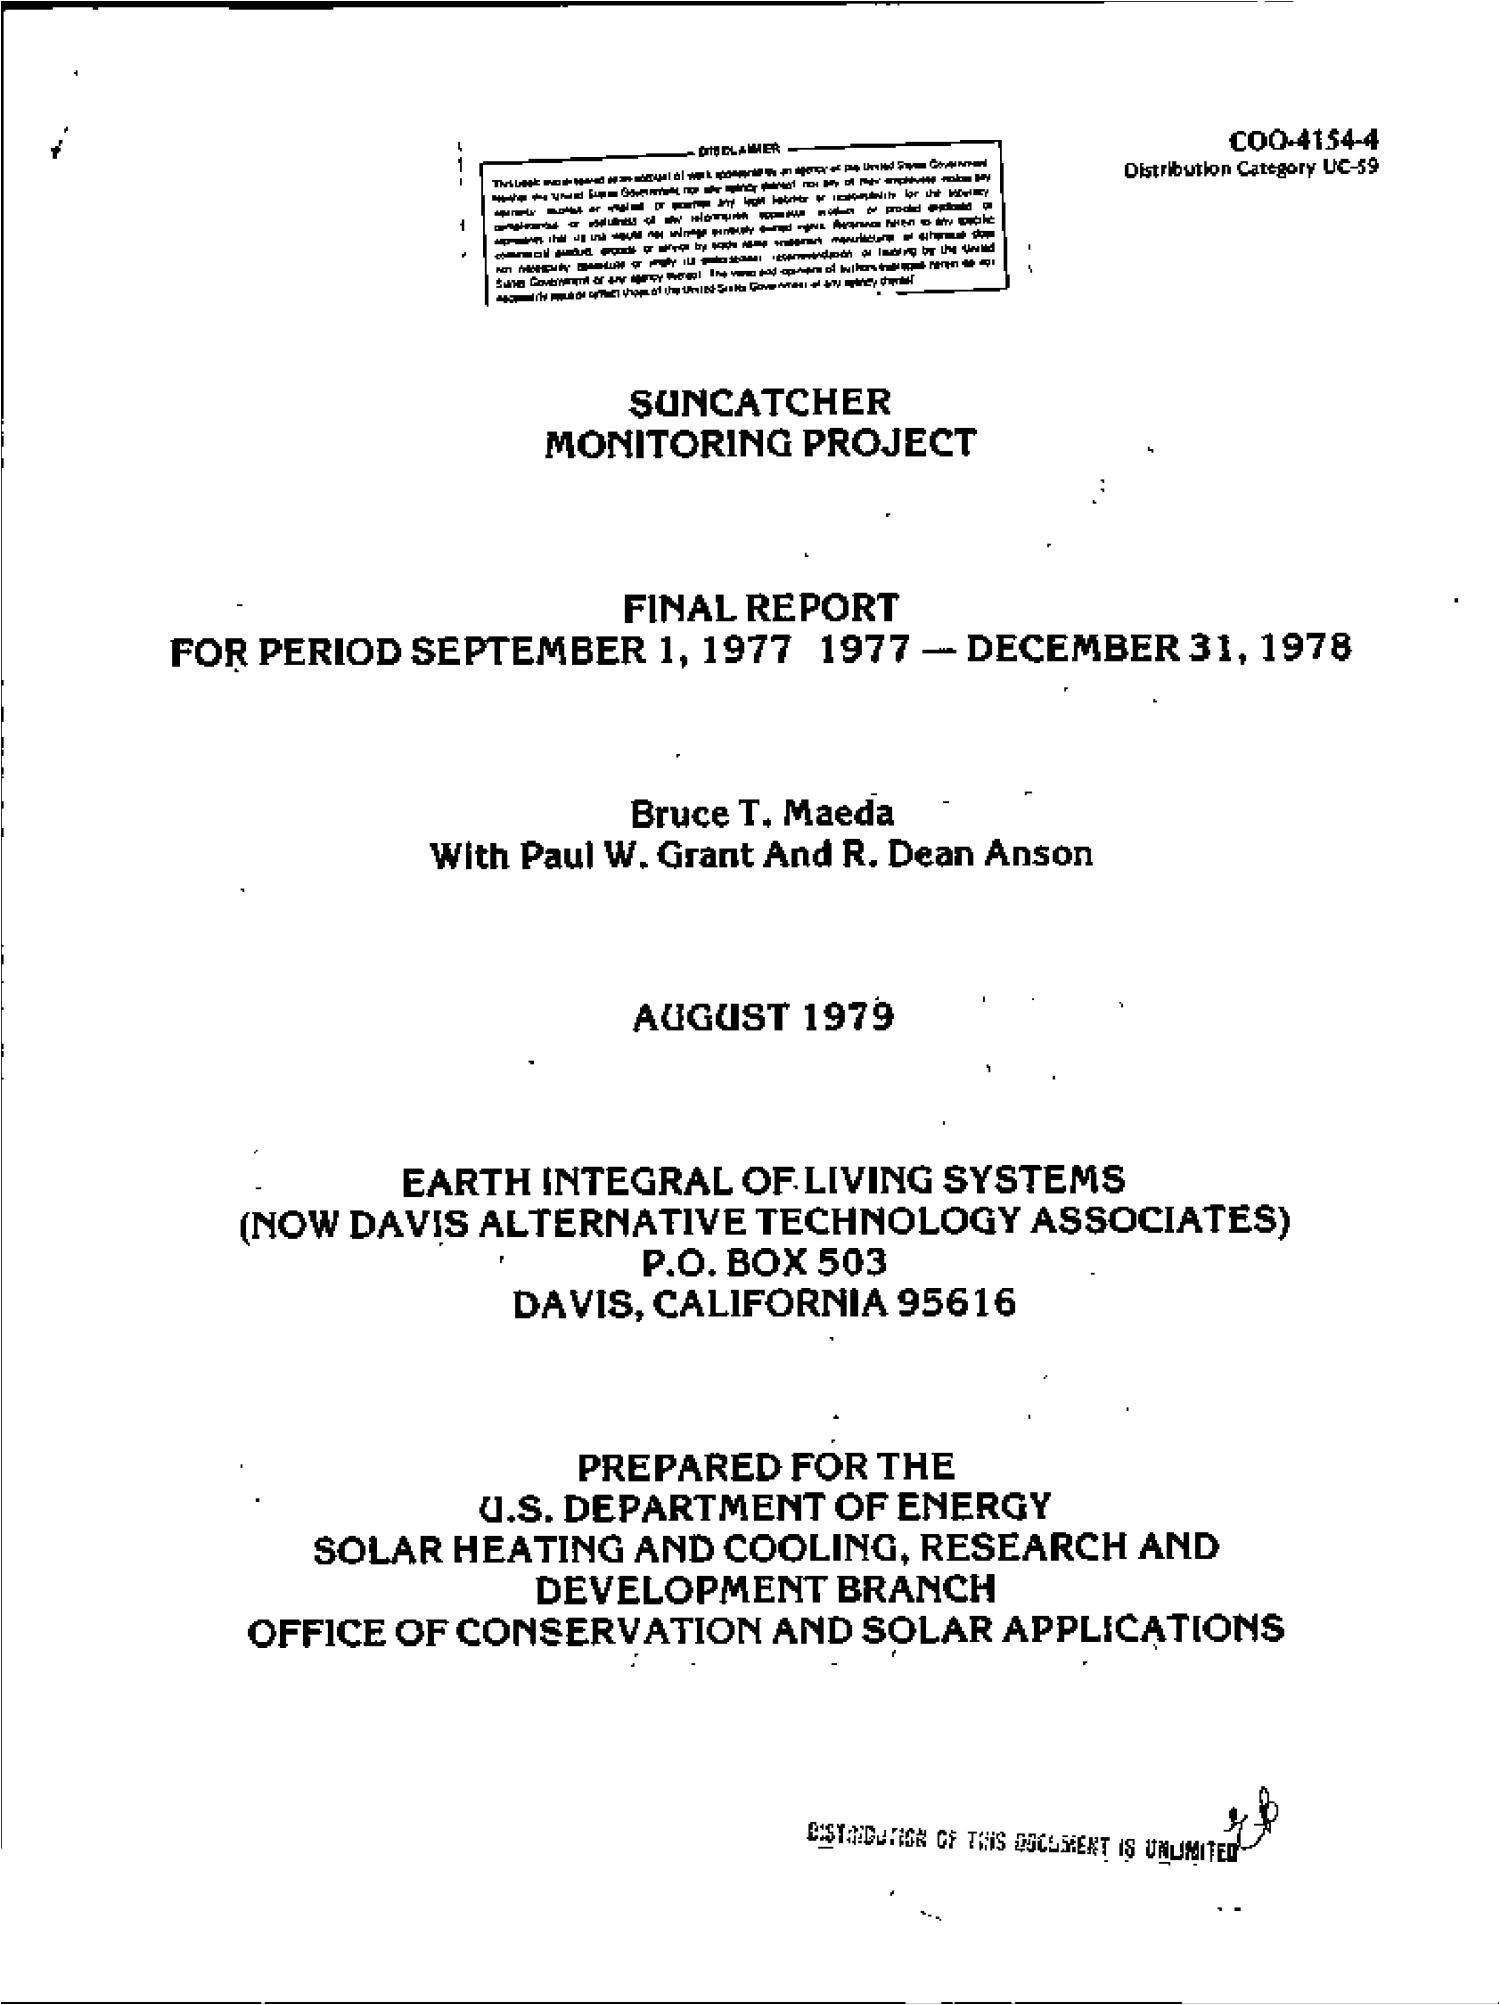 suncatcher monitoring project final report september 1 1977 december 31 1978 digital library